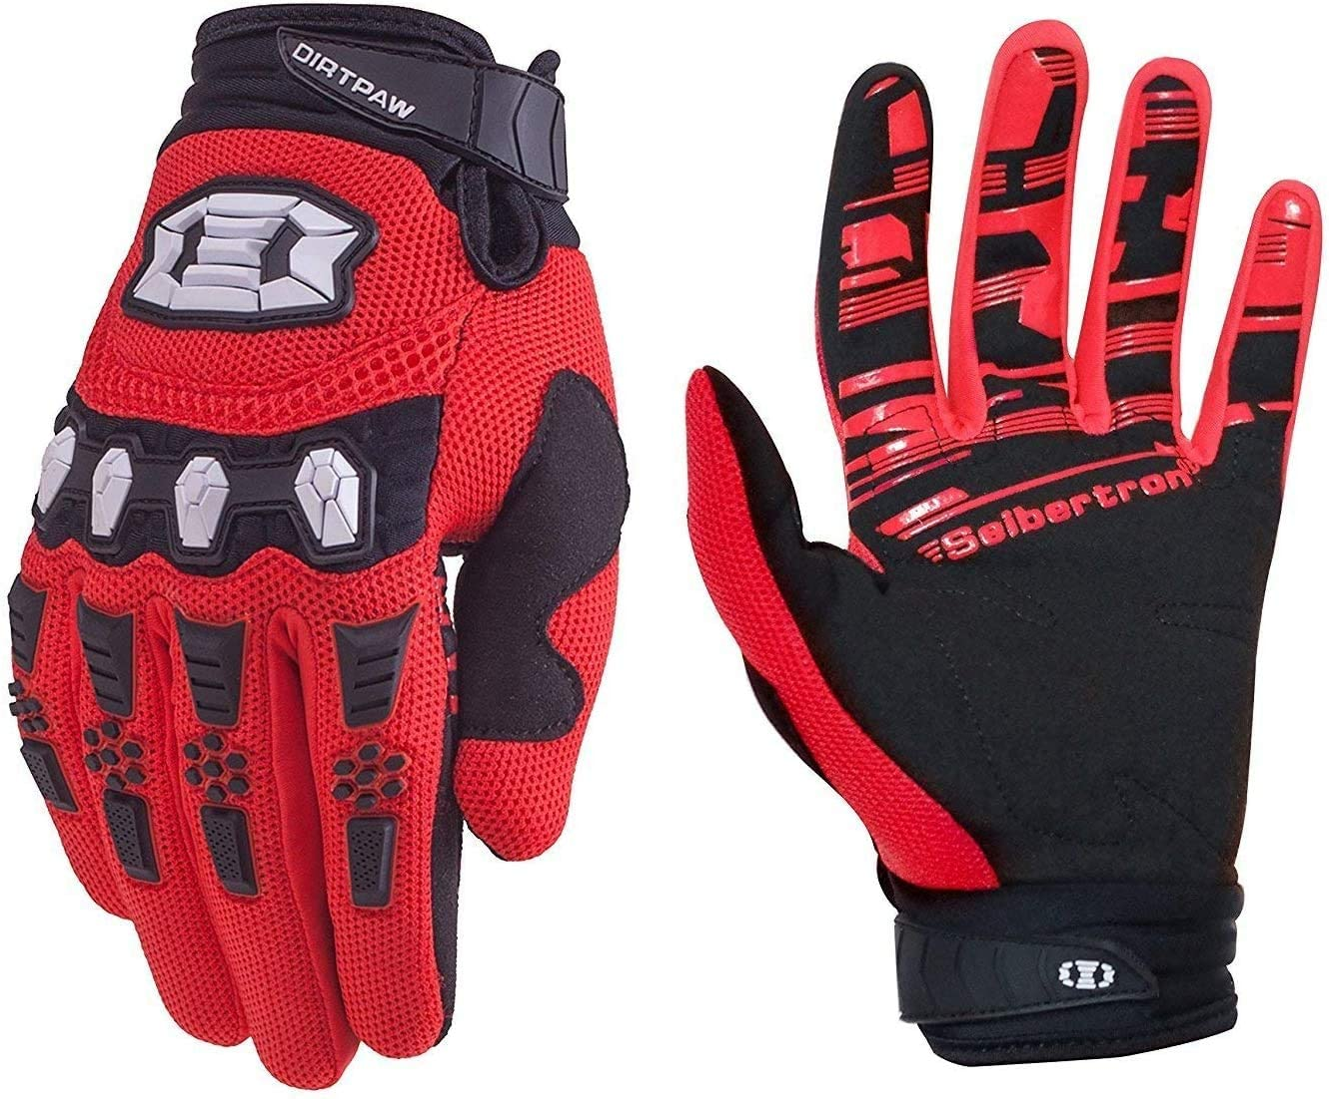 Seibertron Gloves